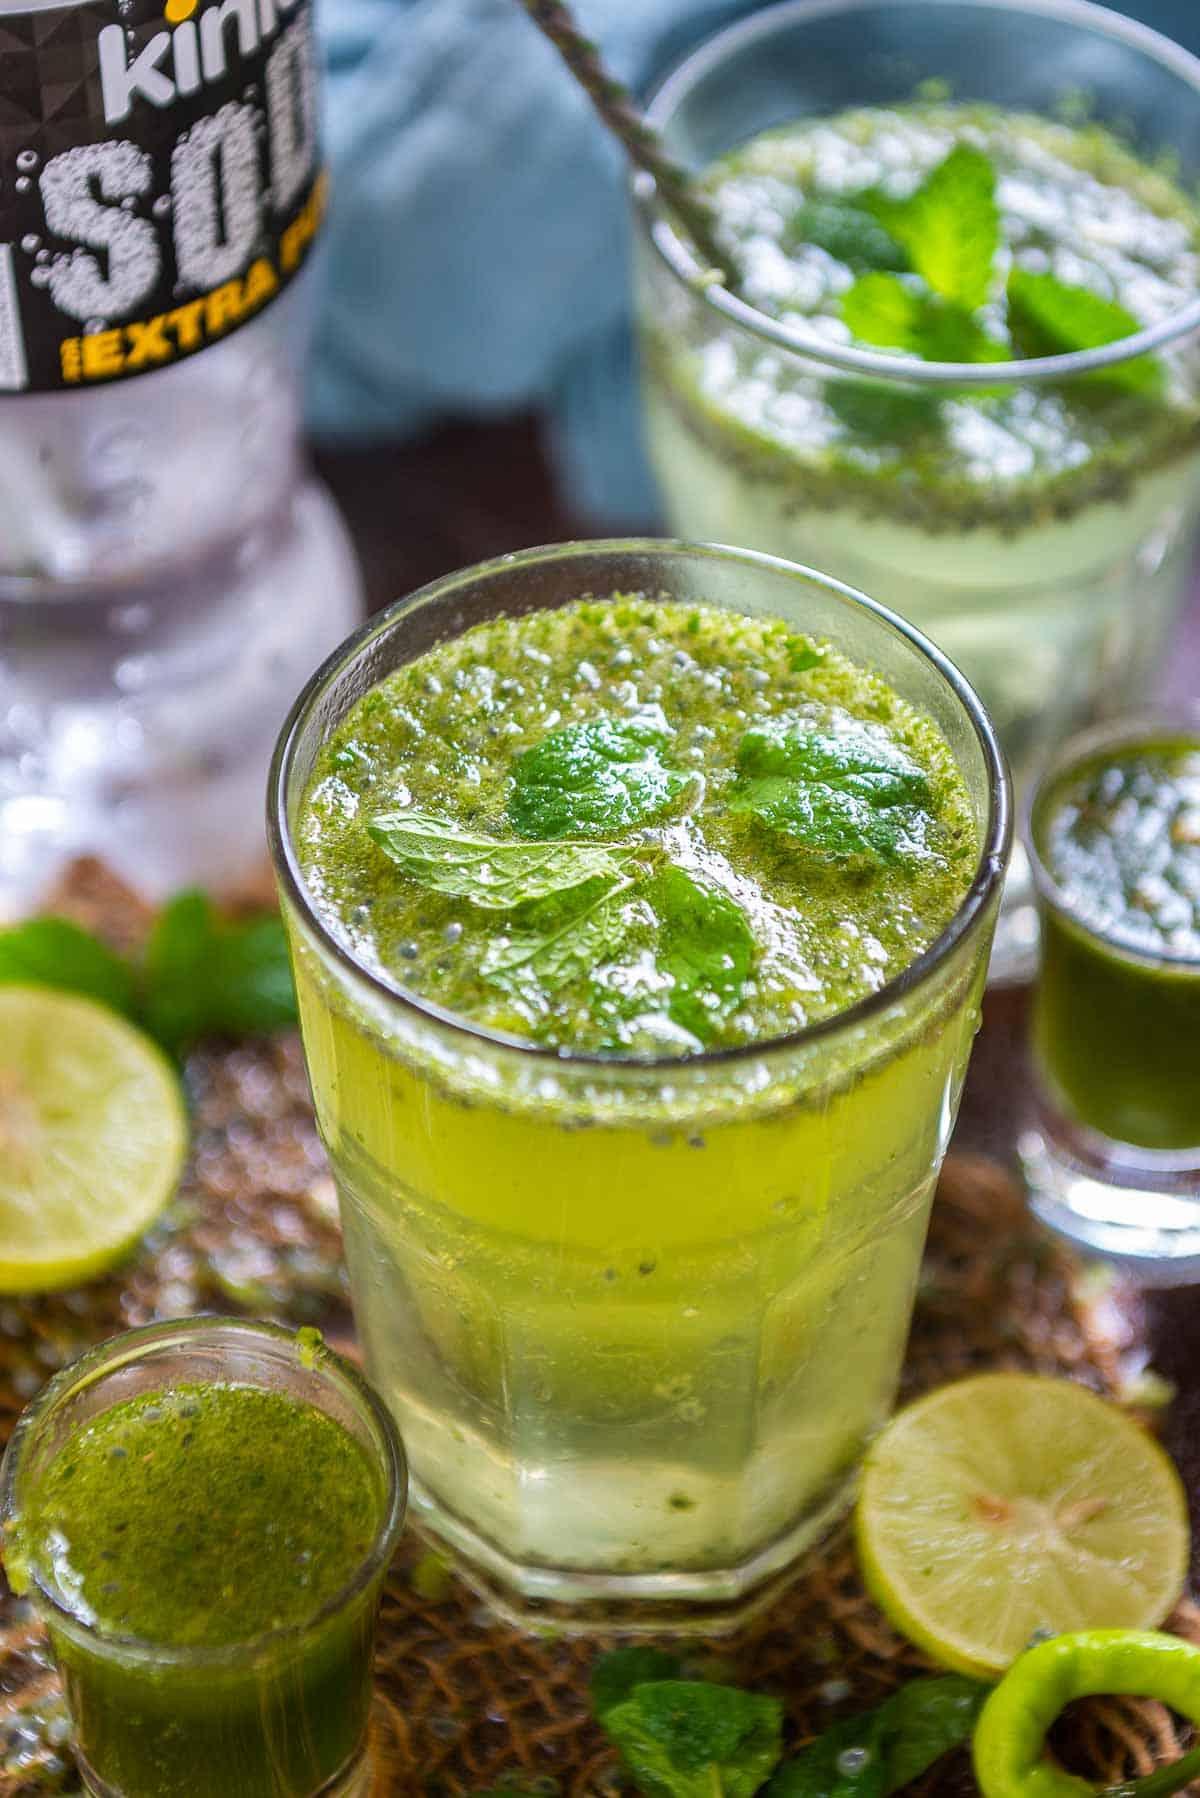 Fuljar soda served in a glass.